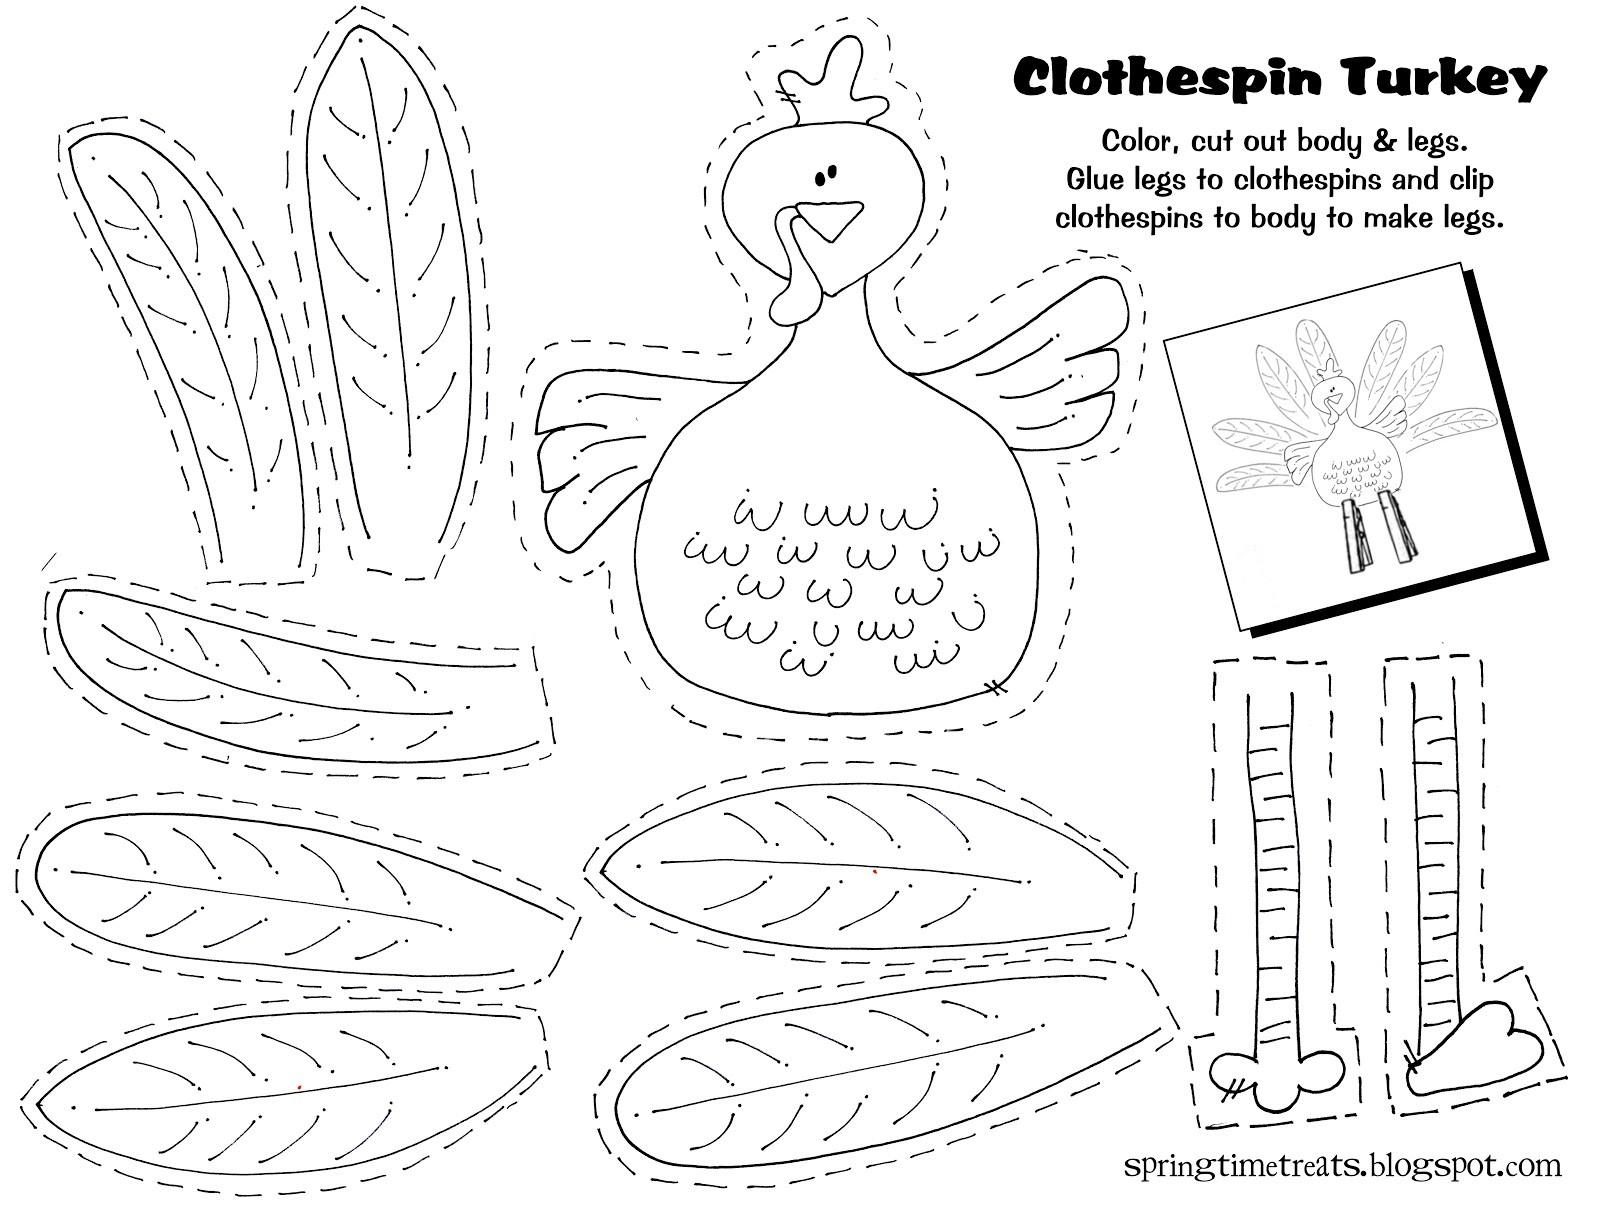 Thanksgiving Turkey Printable  Spring Time Treats Clothespin Turkey